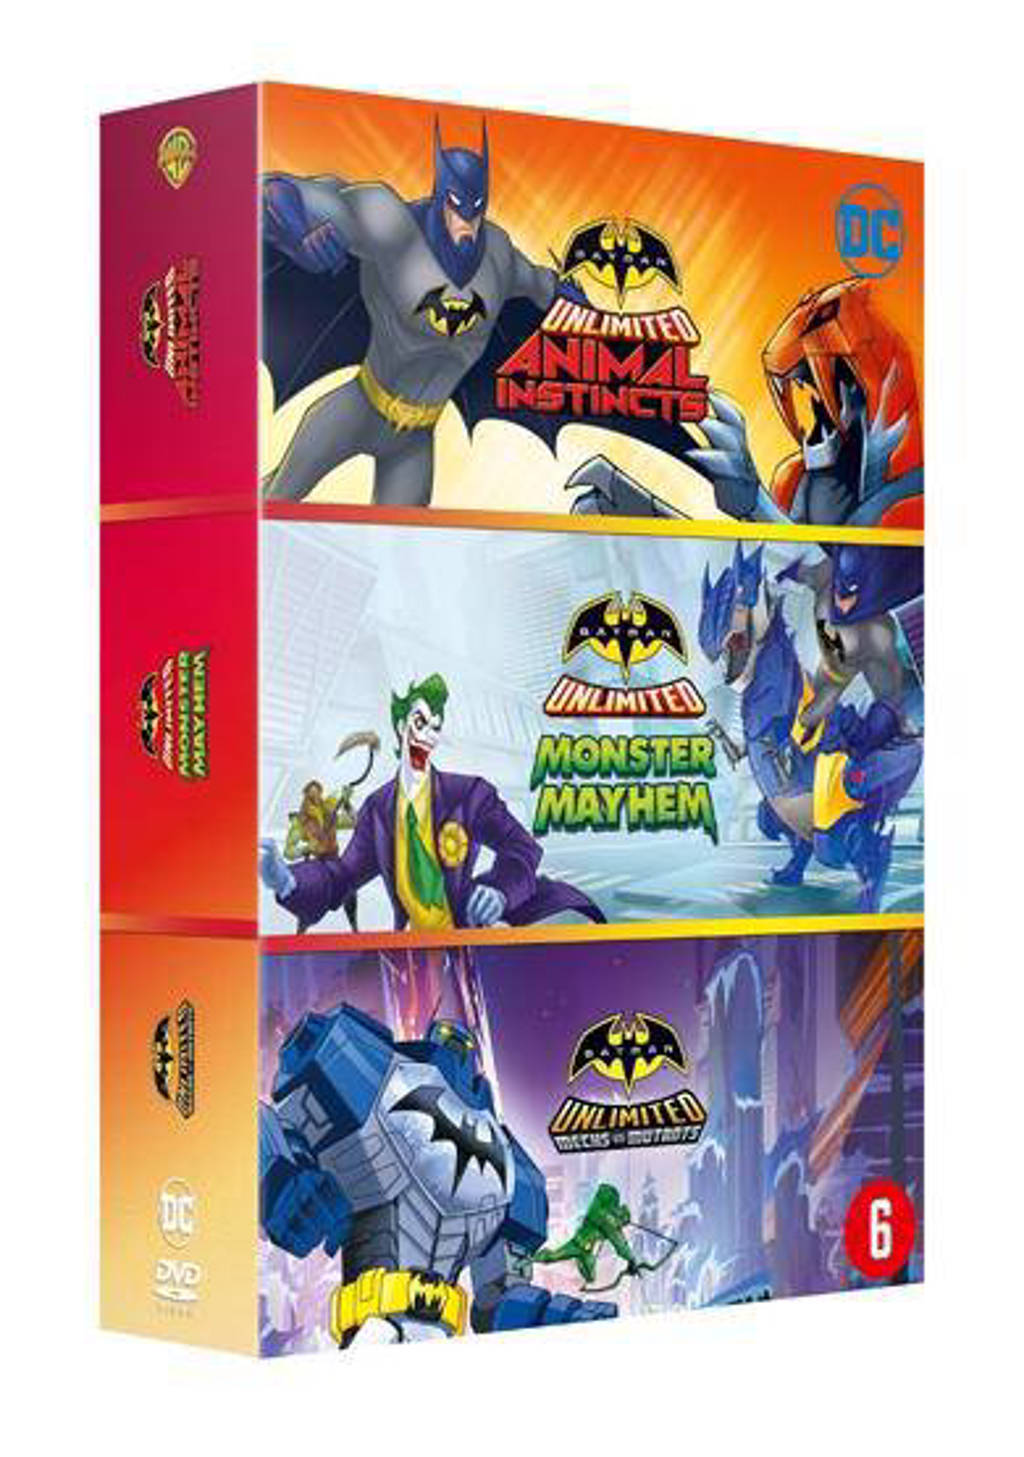 Batman - Unlimited collection  (DVD)